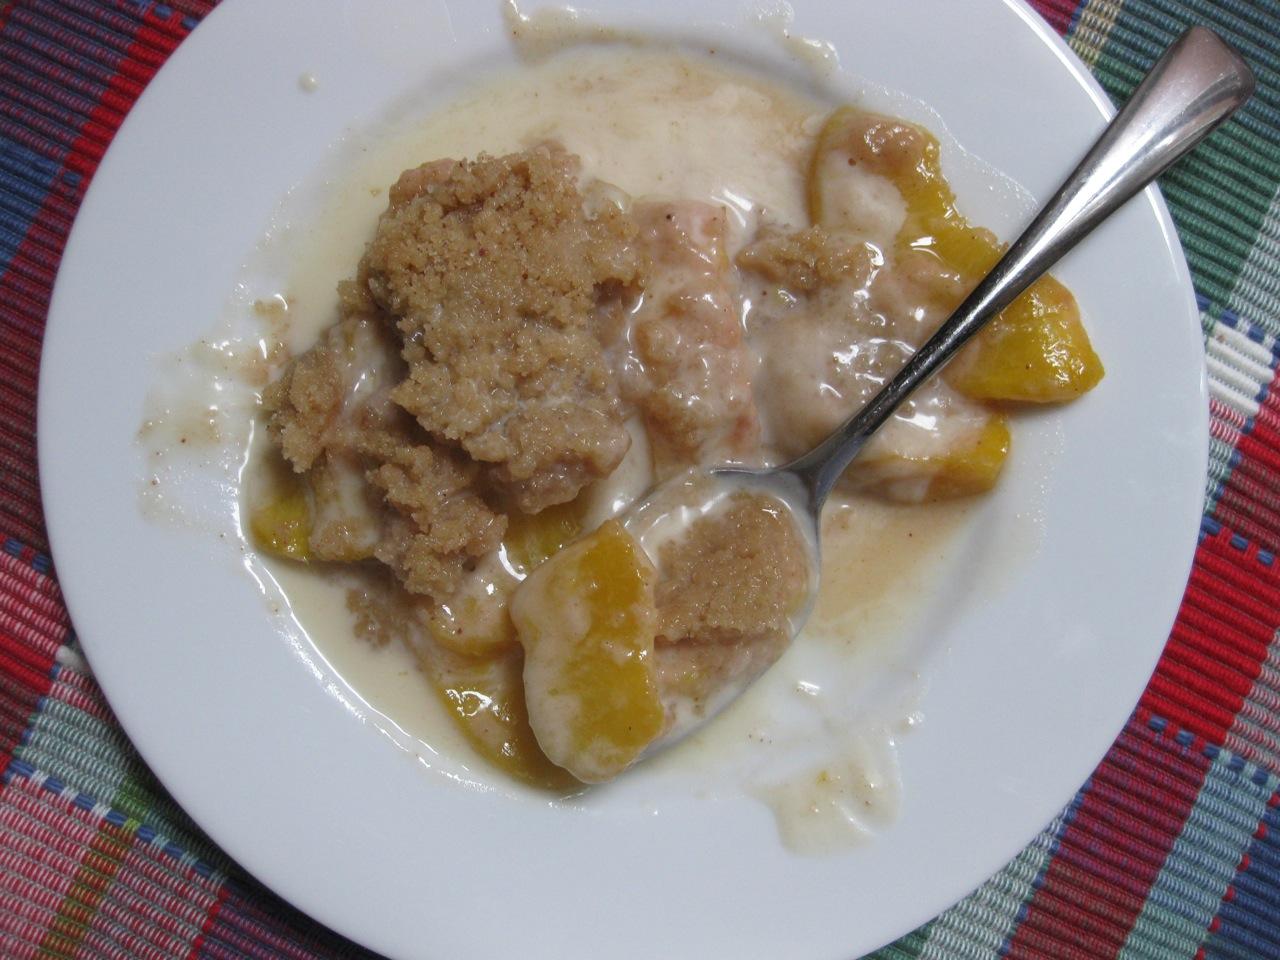 Sunday Treats: Peach Crisp with Maple Cream Sauce, and a song